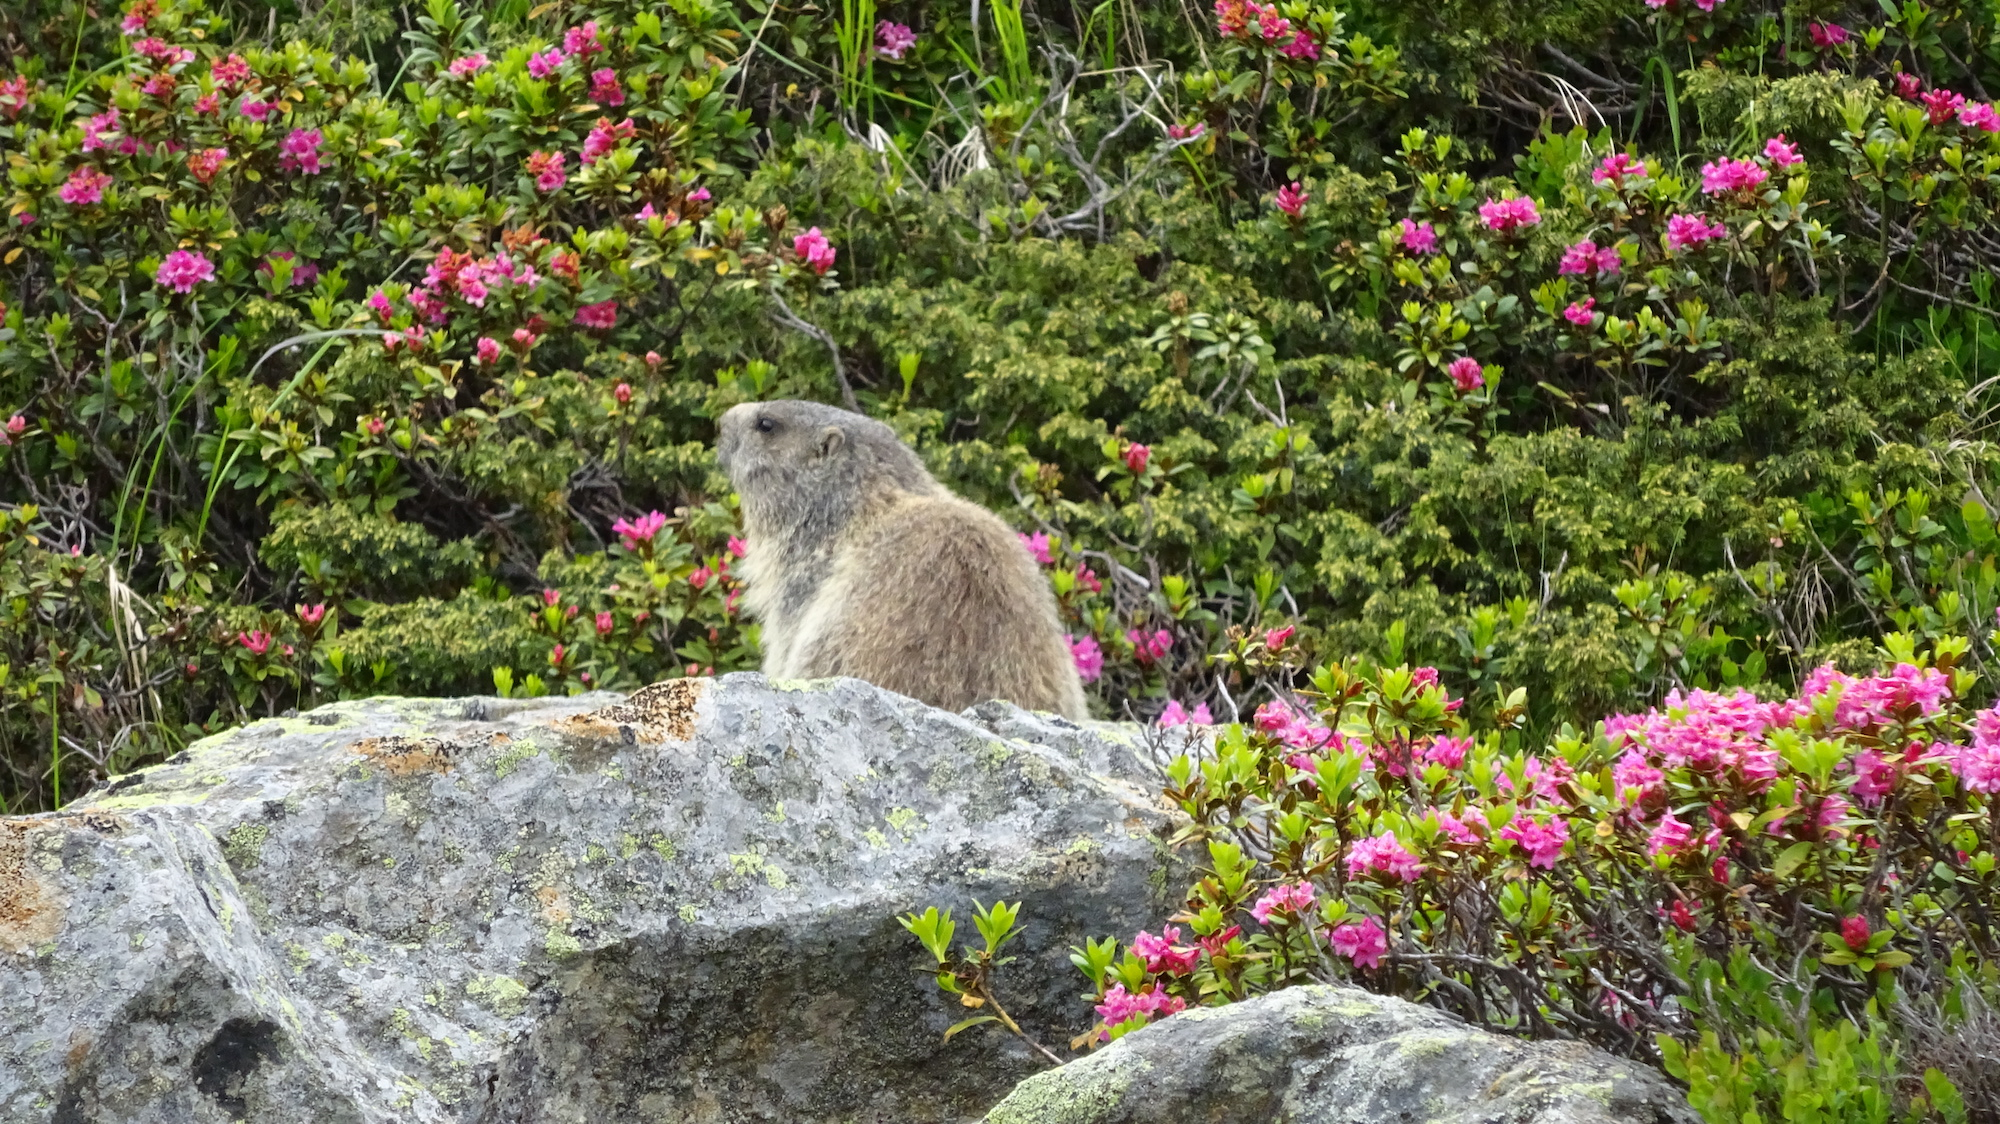 Alpine Marmot Austria